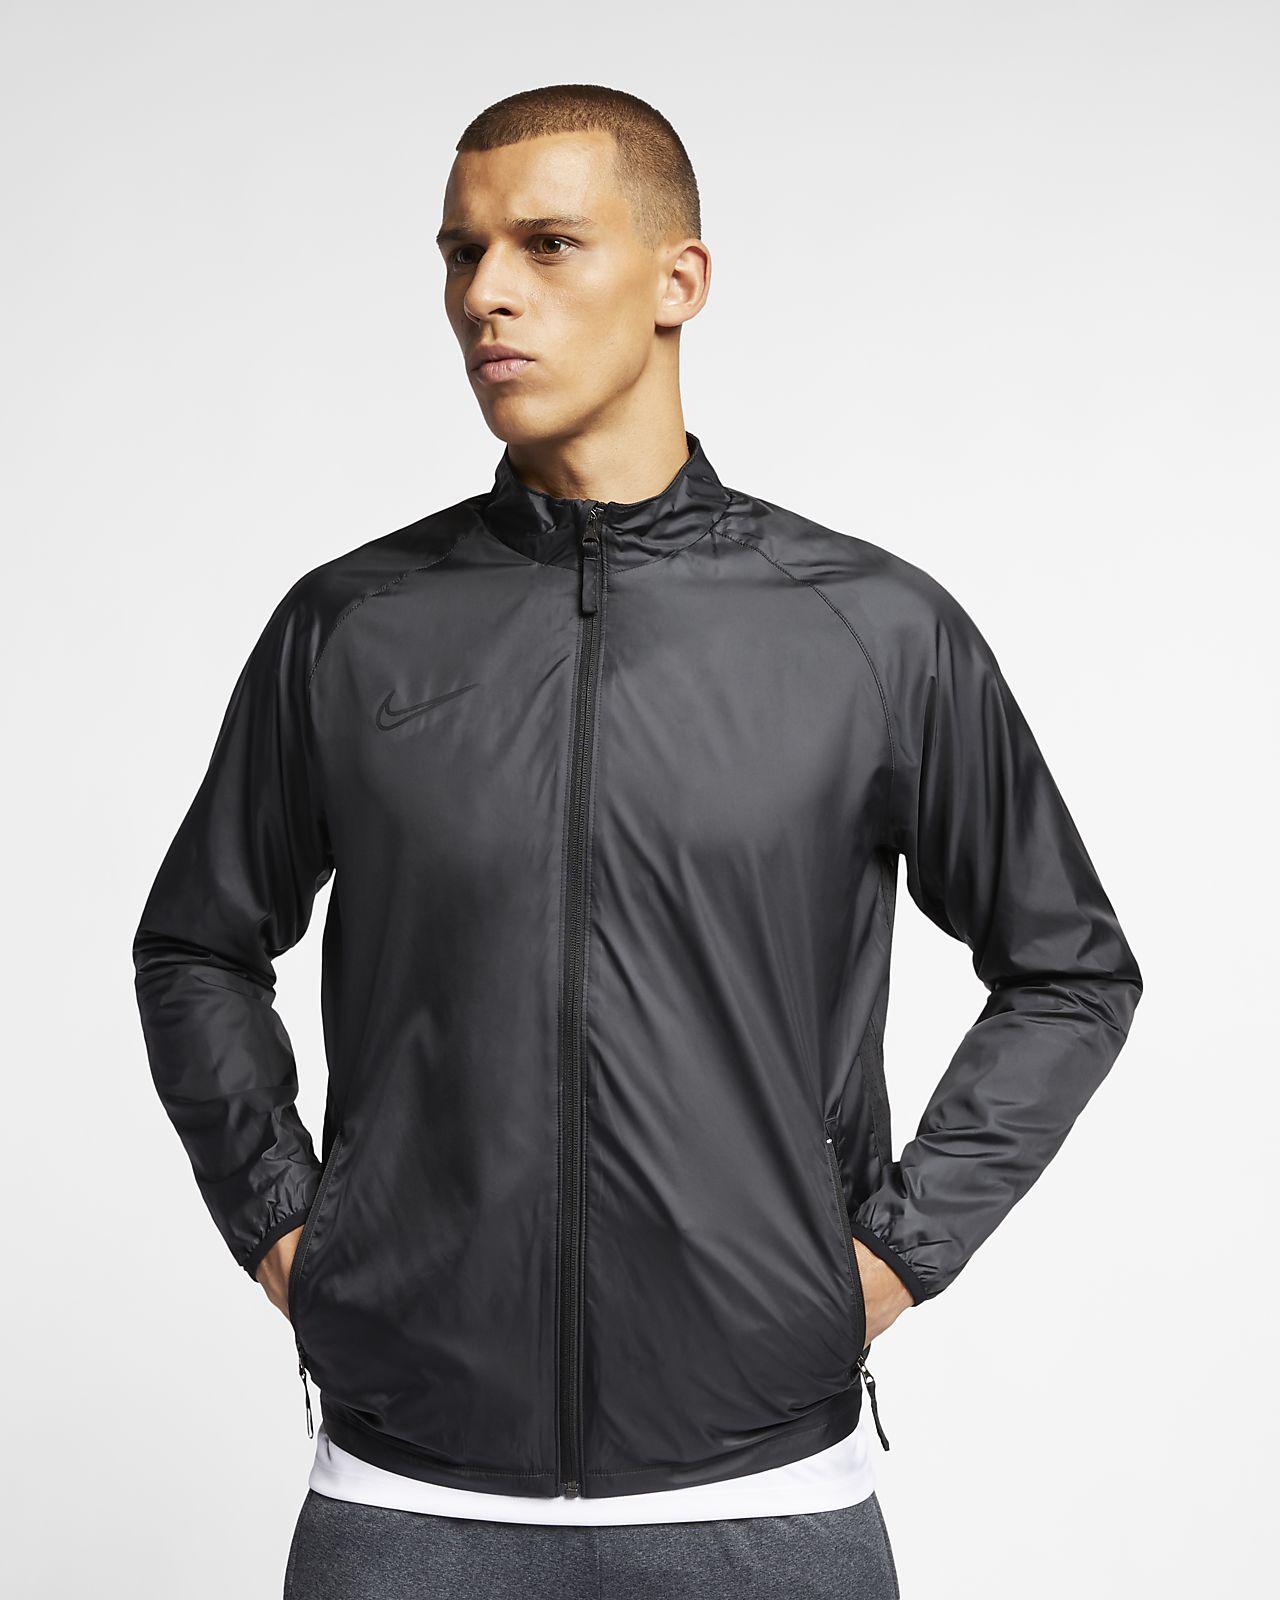 Academy Jacket Repel Nike Men's Soccer FfZPxqA